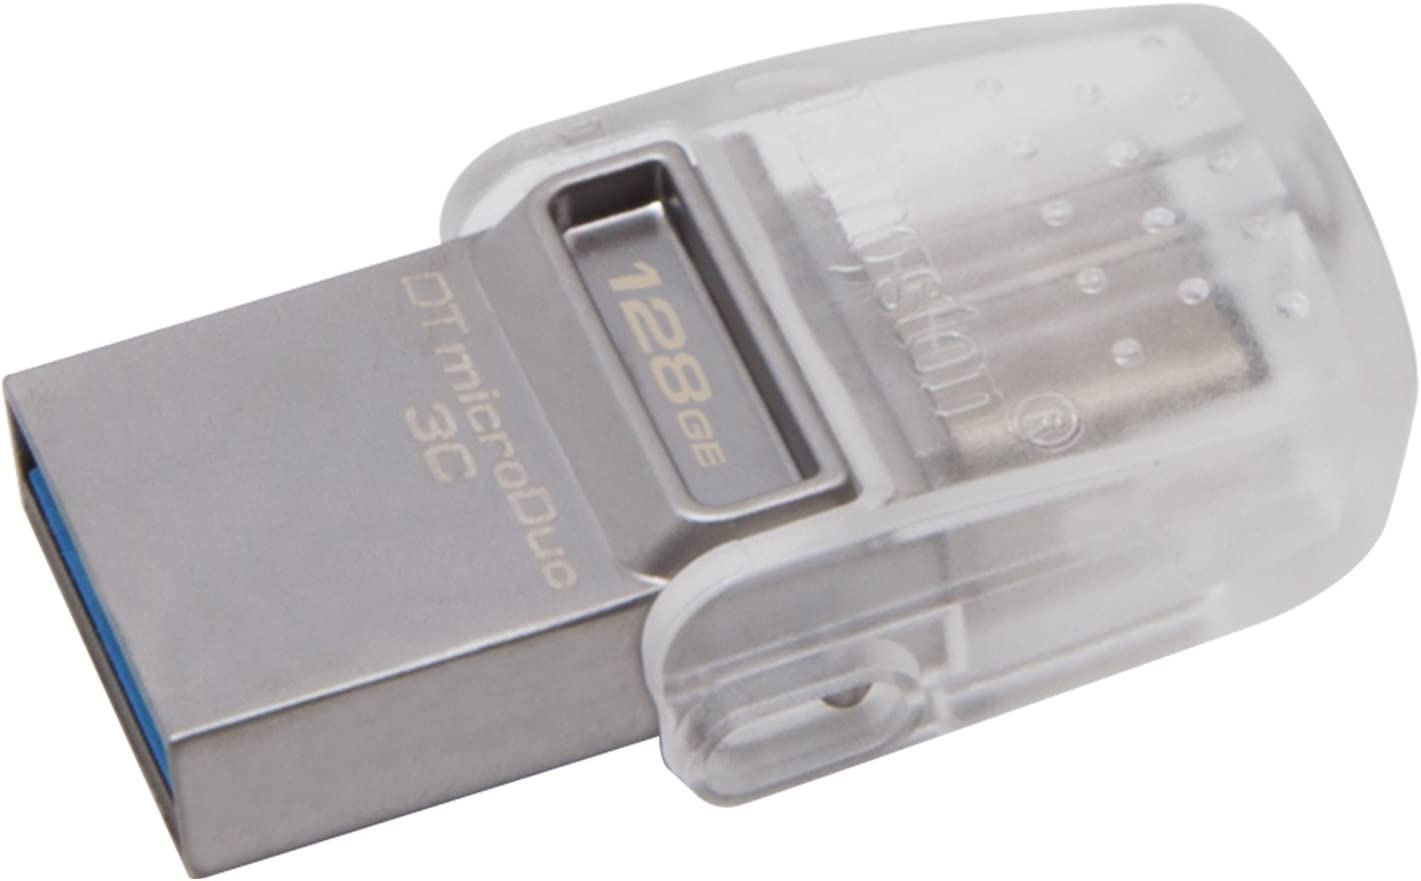 Kingston Digital 128GB Data Traveler Micro Duo USB 3C Flash Drive (DTDUO3C/128GB)